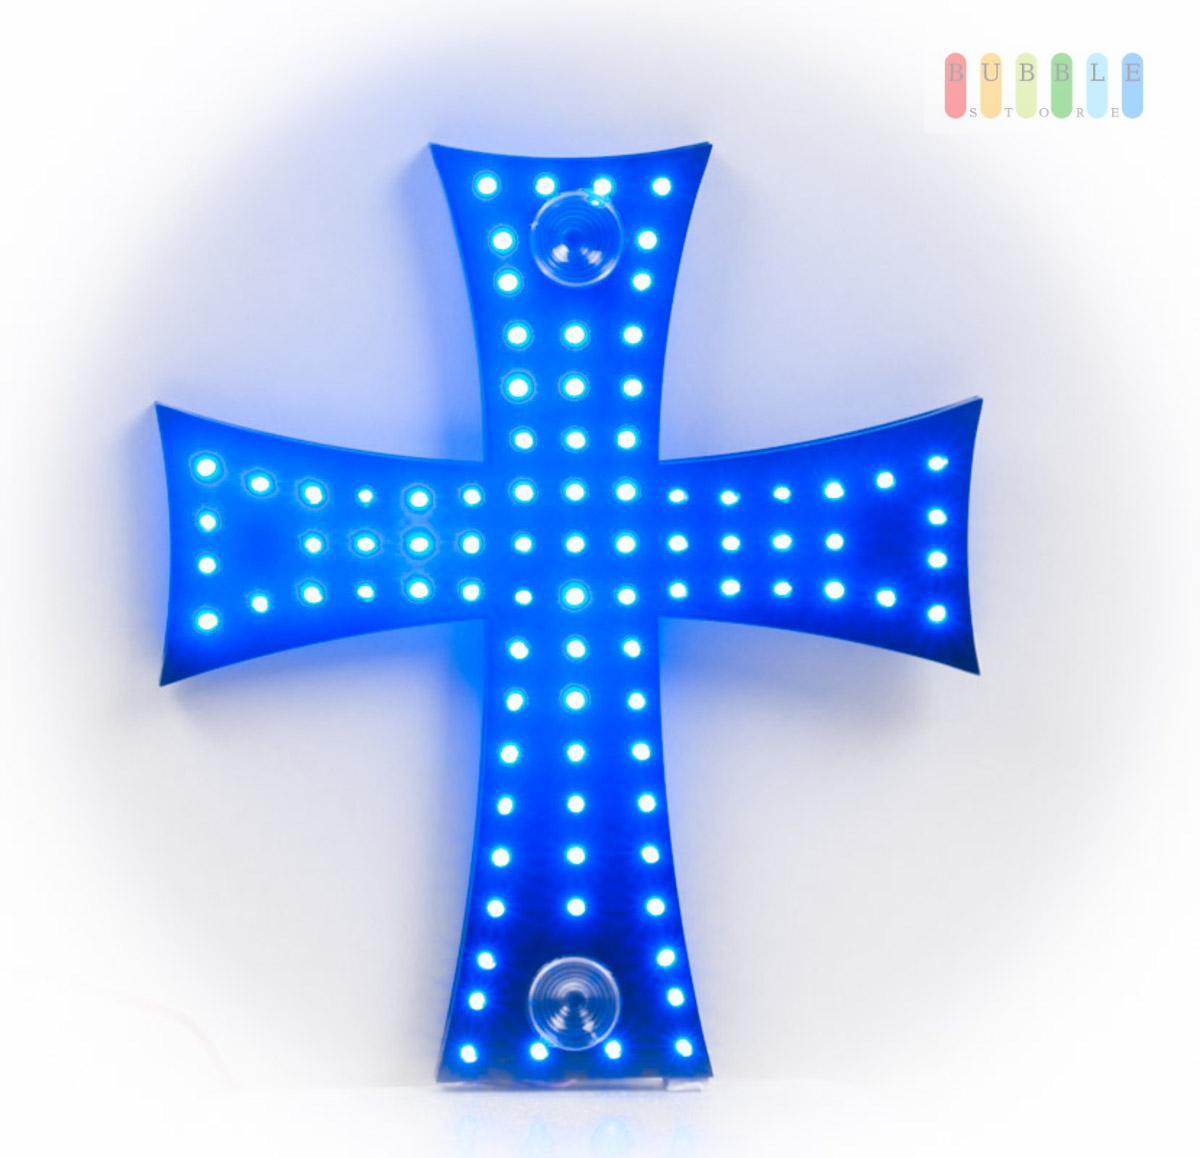 88 led kreuz leuchte beleuchtung lkw trucker fahrerkabine innenleuchte blau 24v ebay. Black Bedroom Furniture Sets. Home Design Ideas